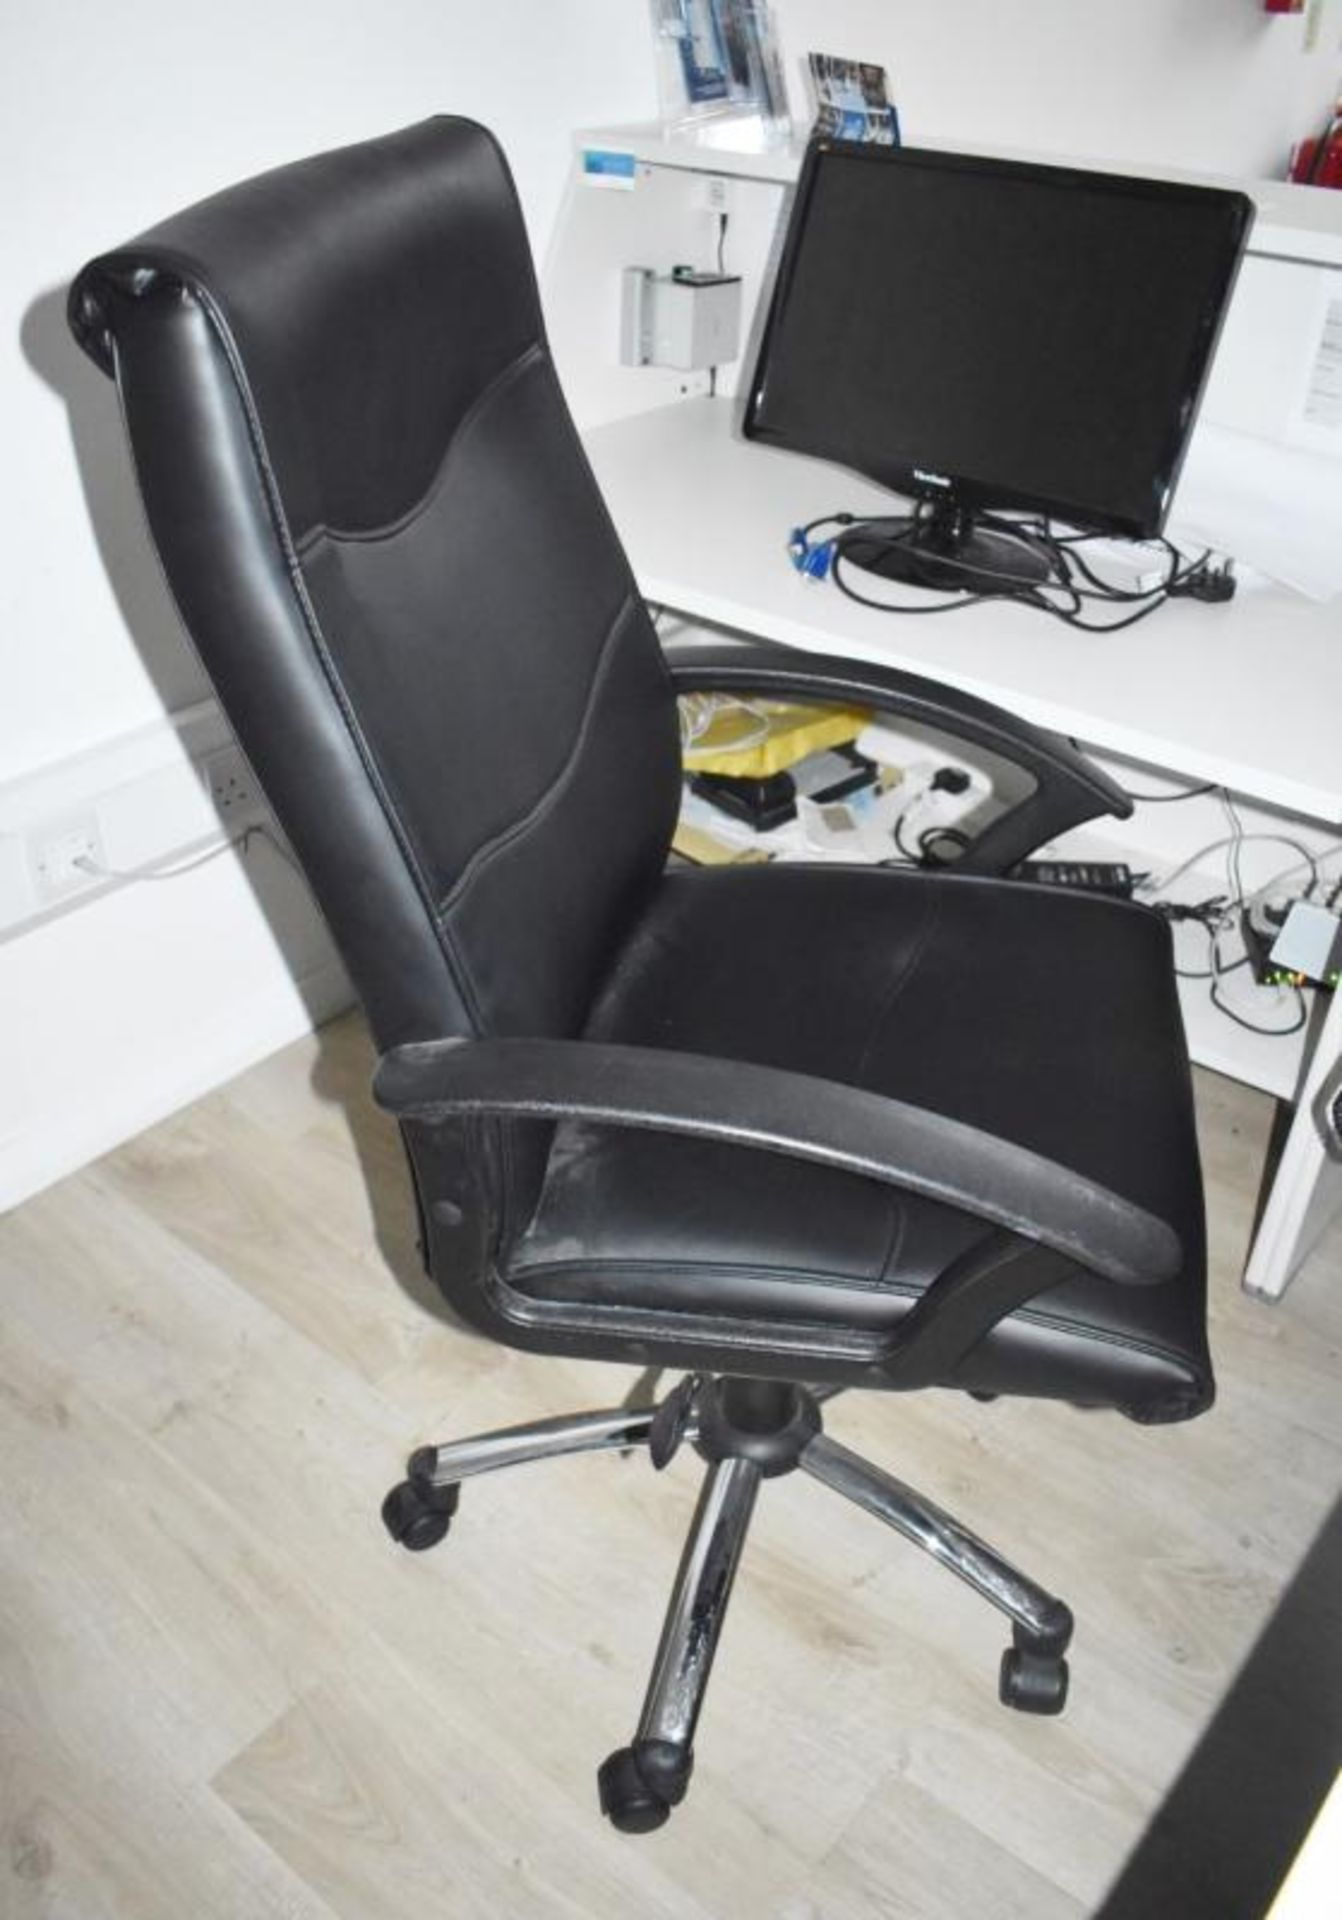 Lot 383 - 1 x Black Faux Leather Office Swivel Chair - CL490 - Location: Putney, London, SW15 Auction